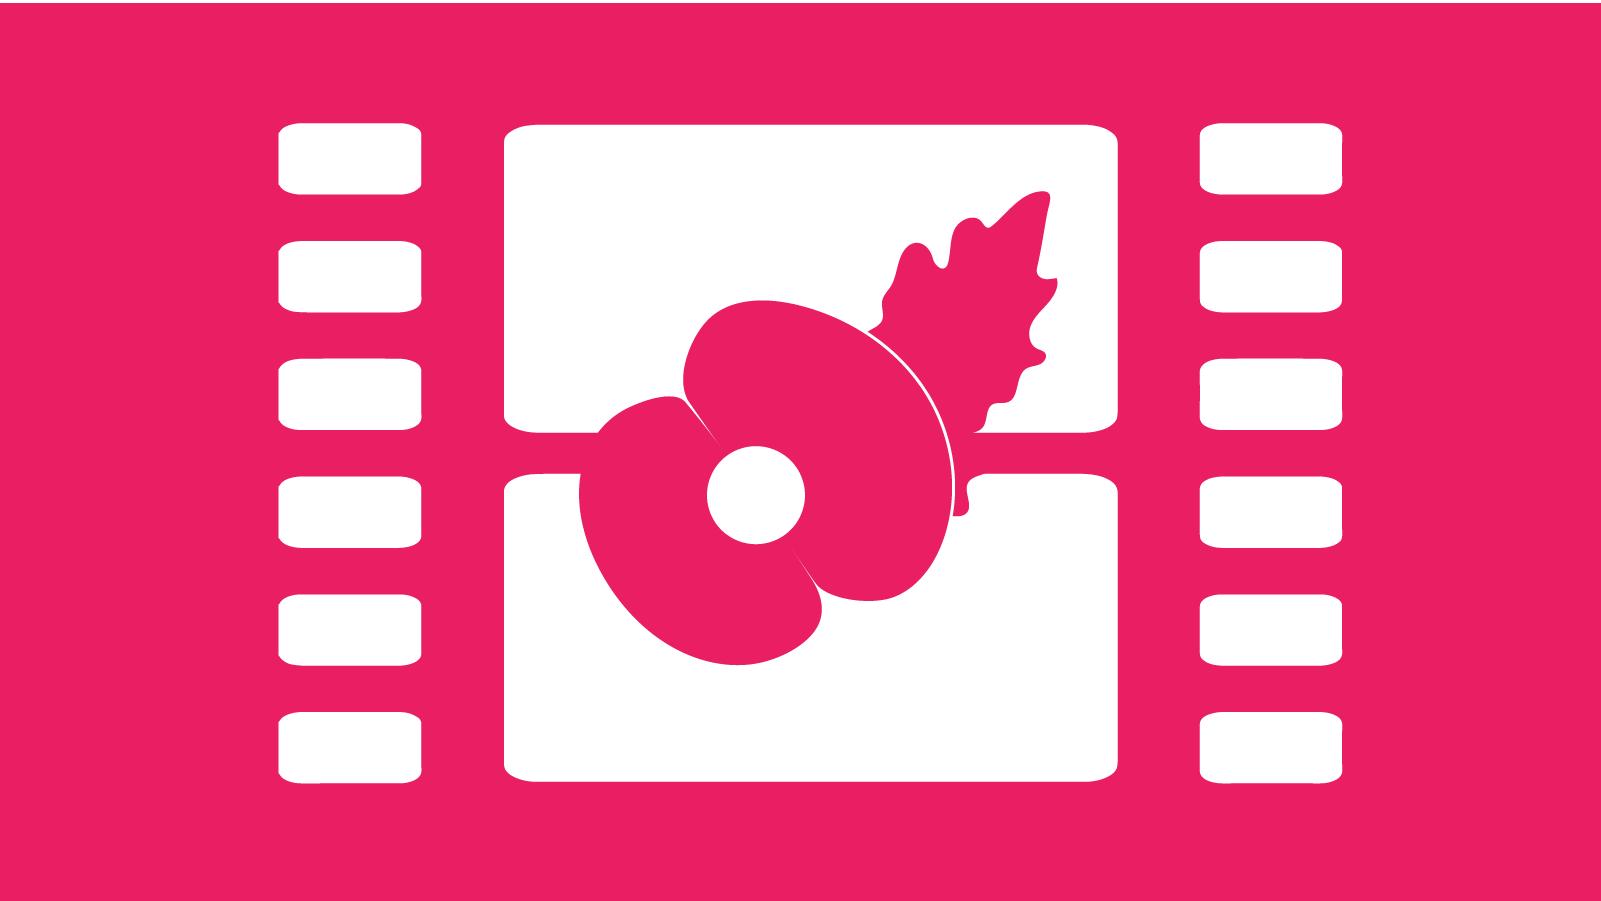 WW1 Heroism: Through Art and Film (FutureLearn)